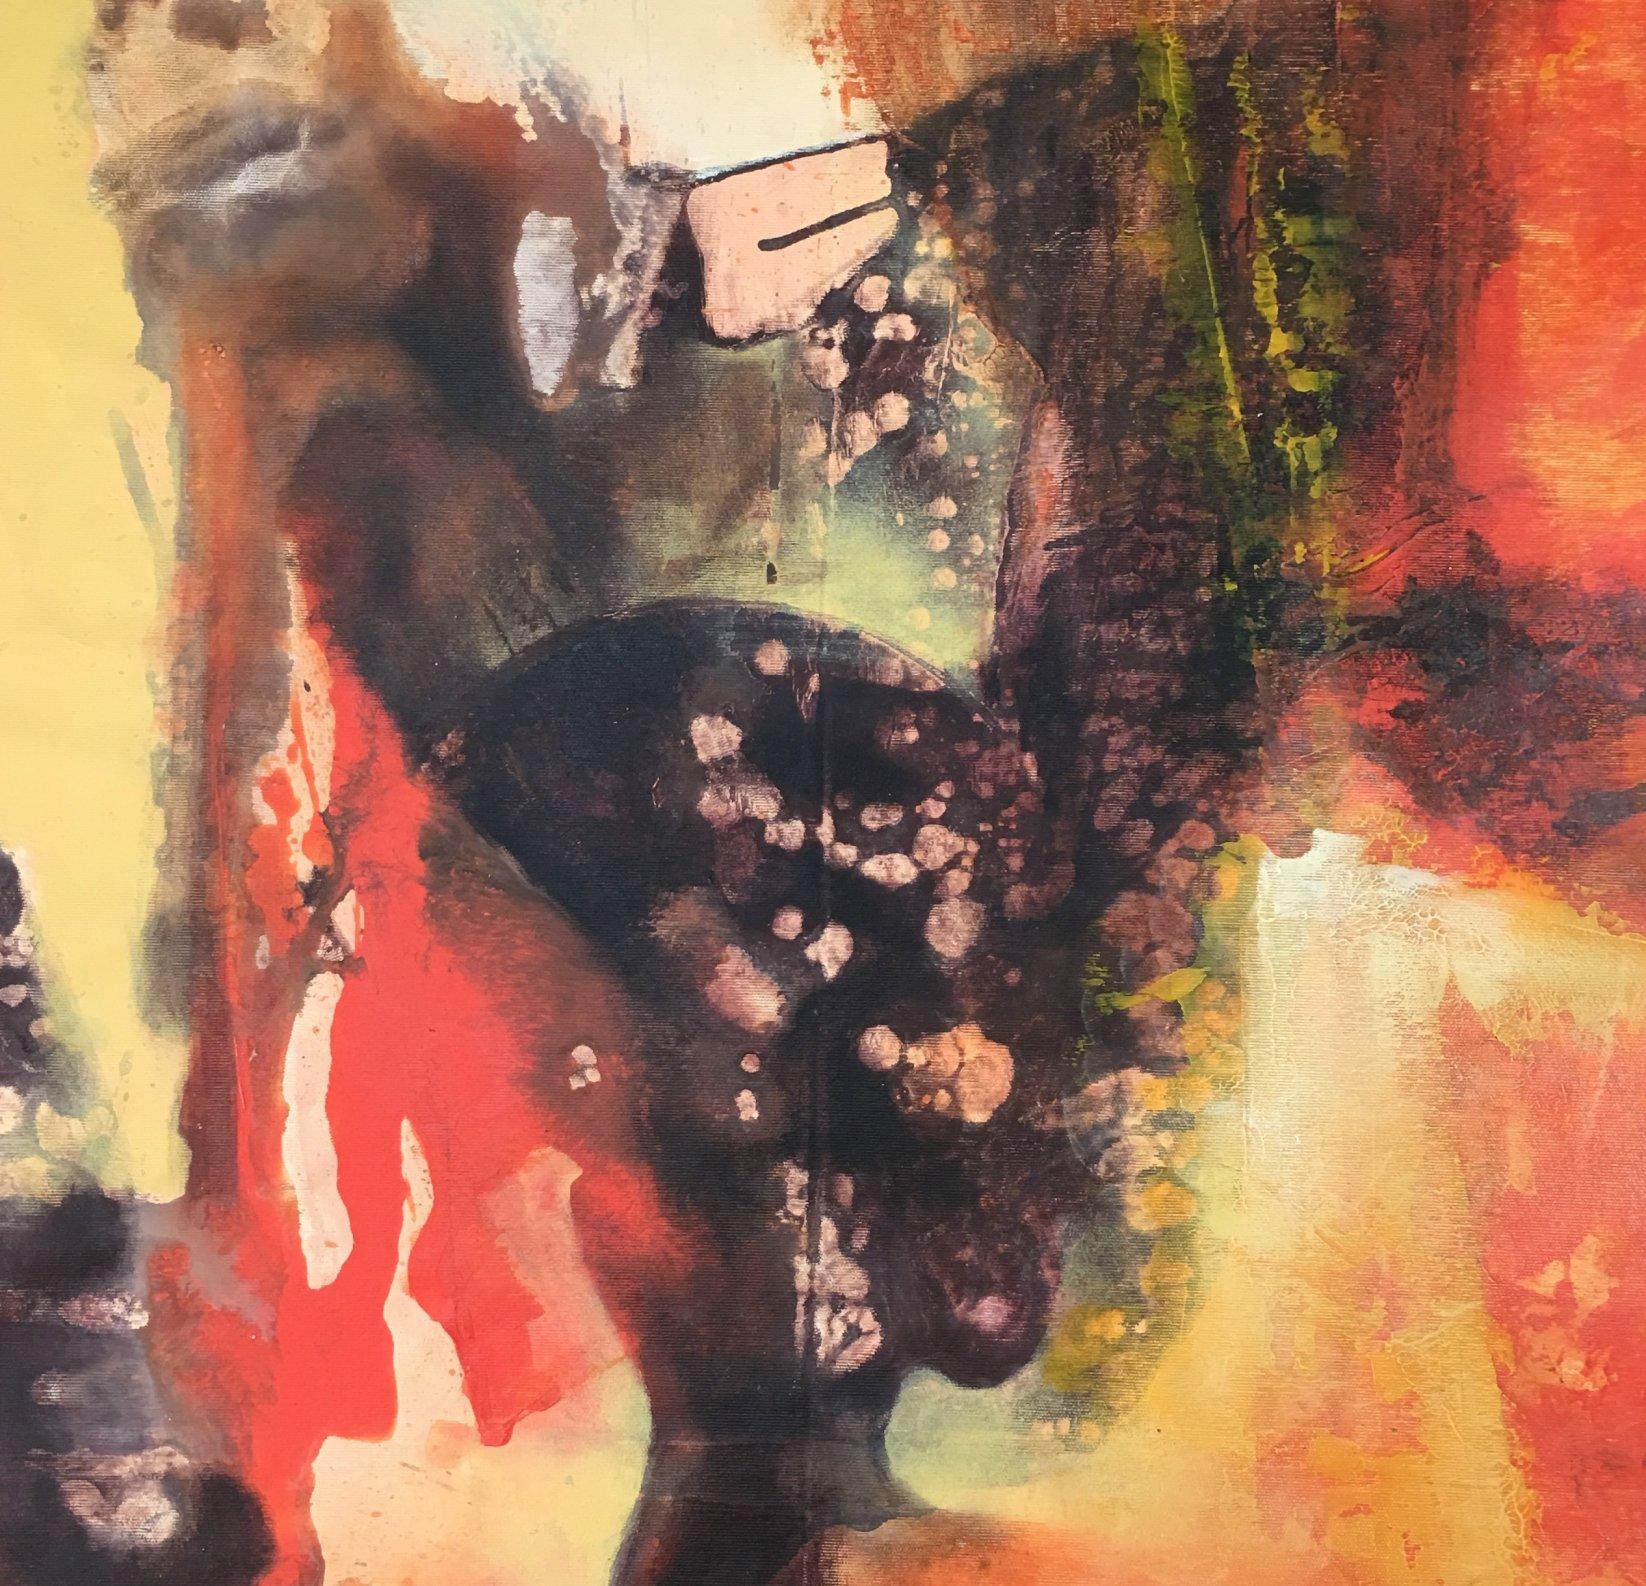 """SENTIDO APARENTE "" SIN TITULO (2018) - Raylven Friman"